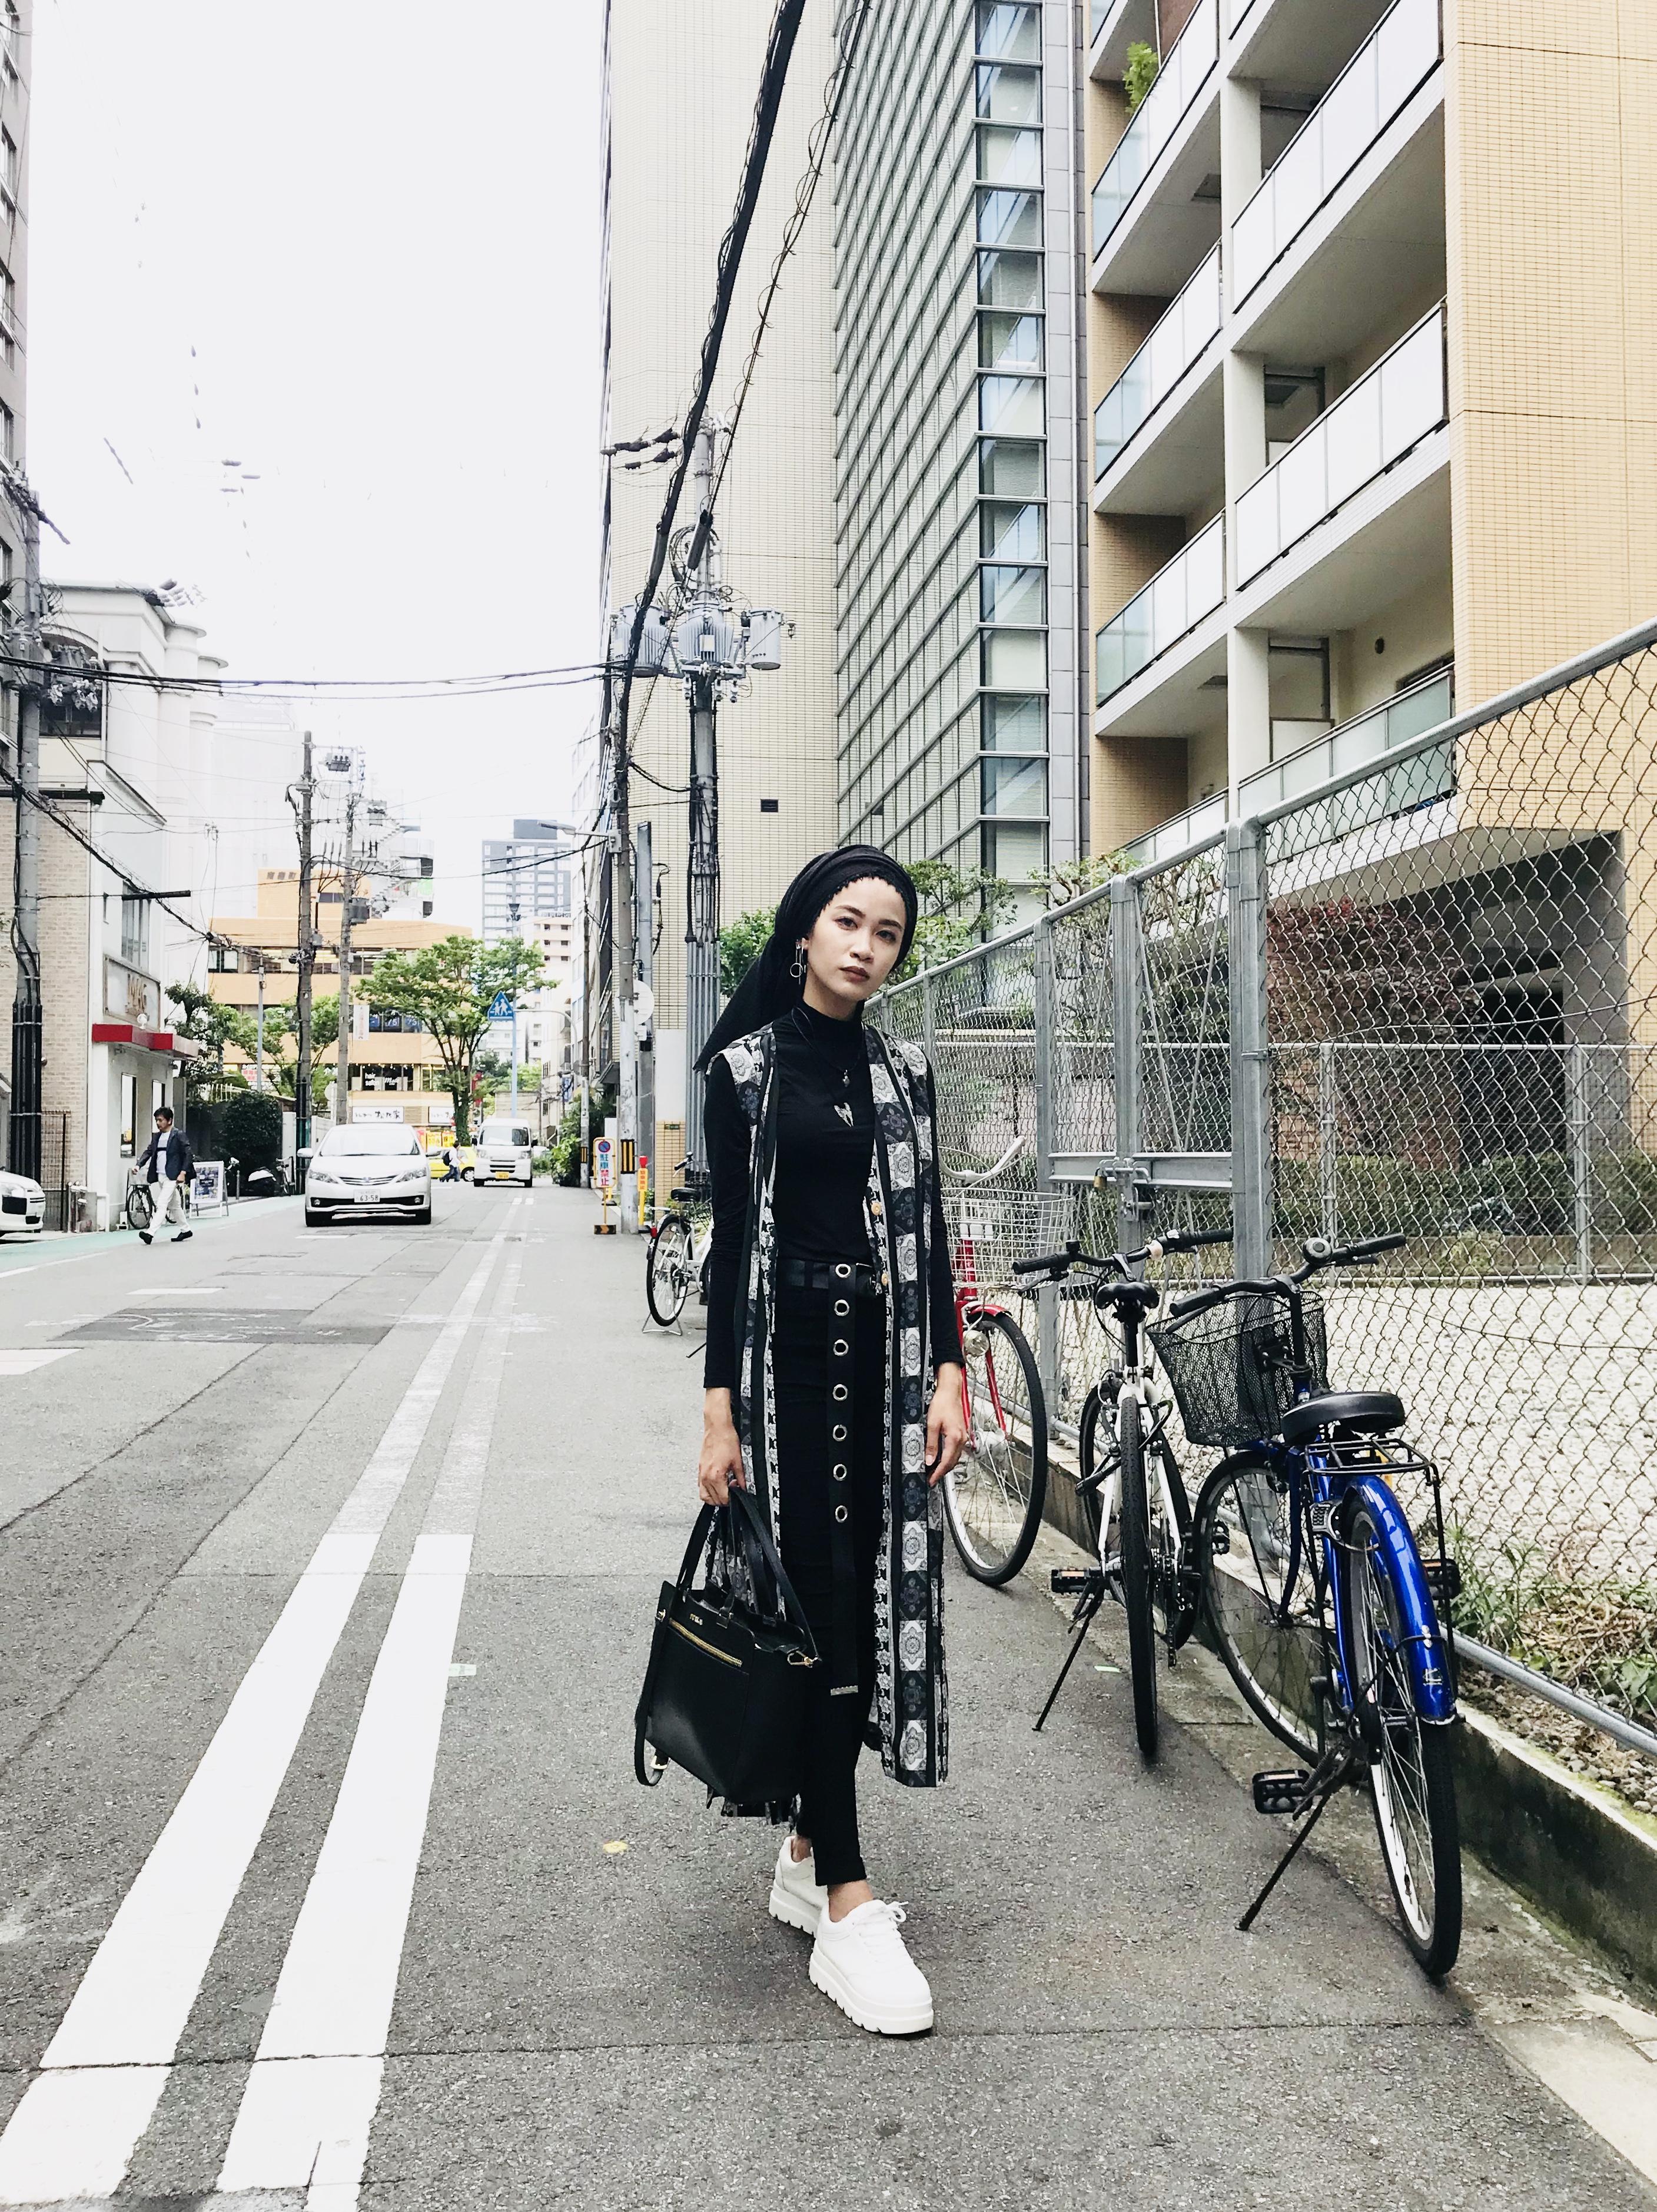 Osaka, Japan, July 2018